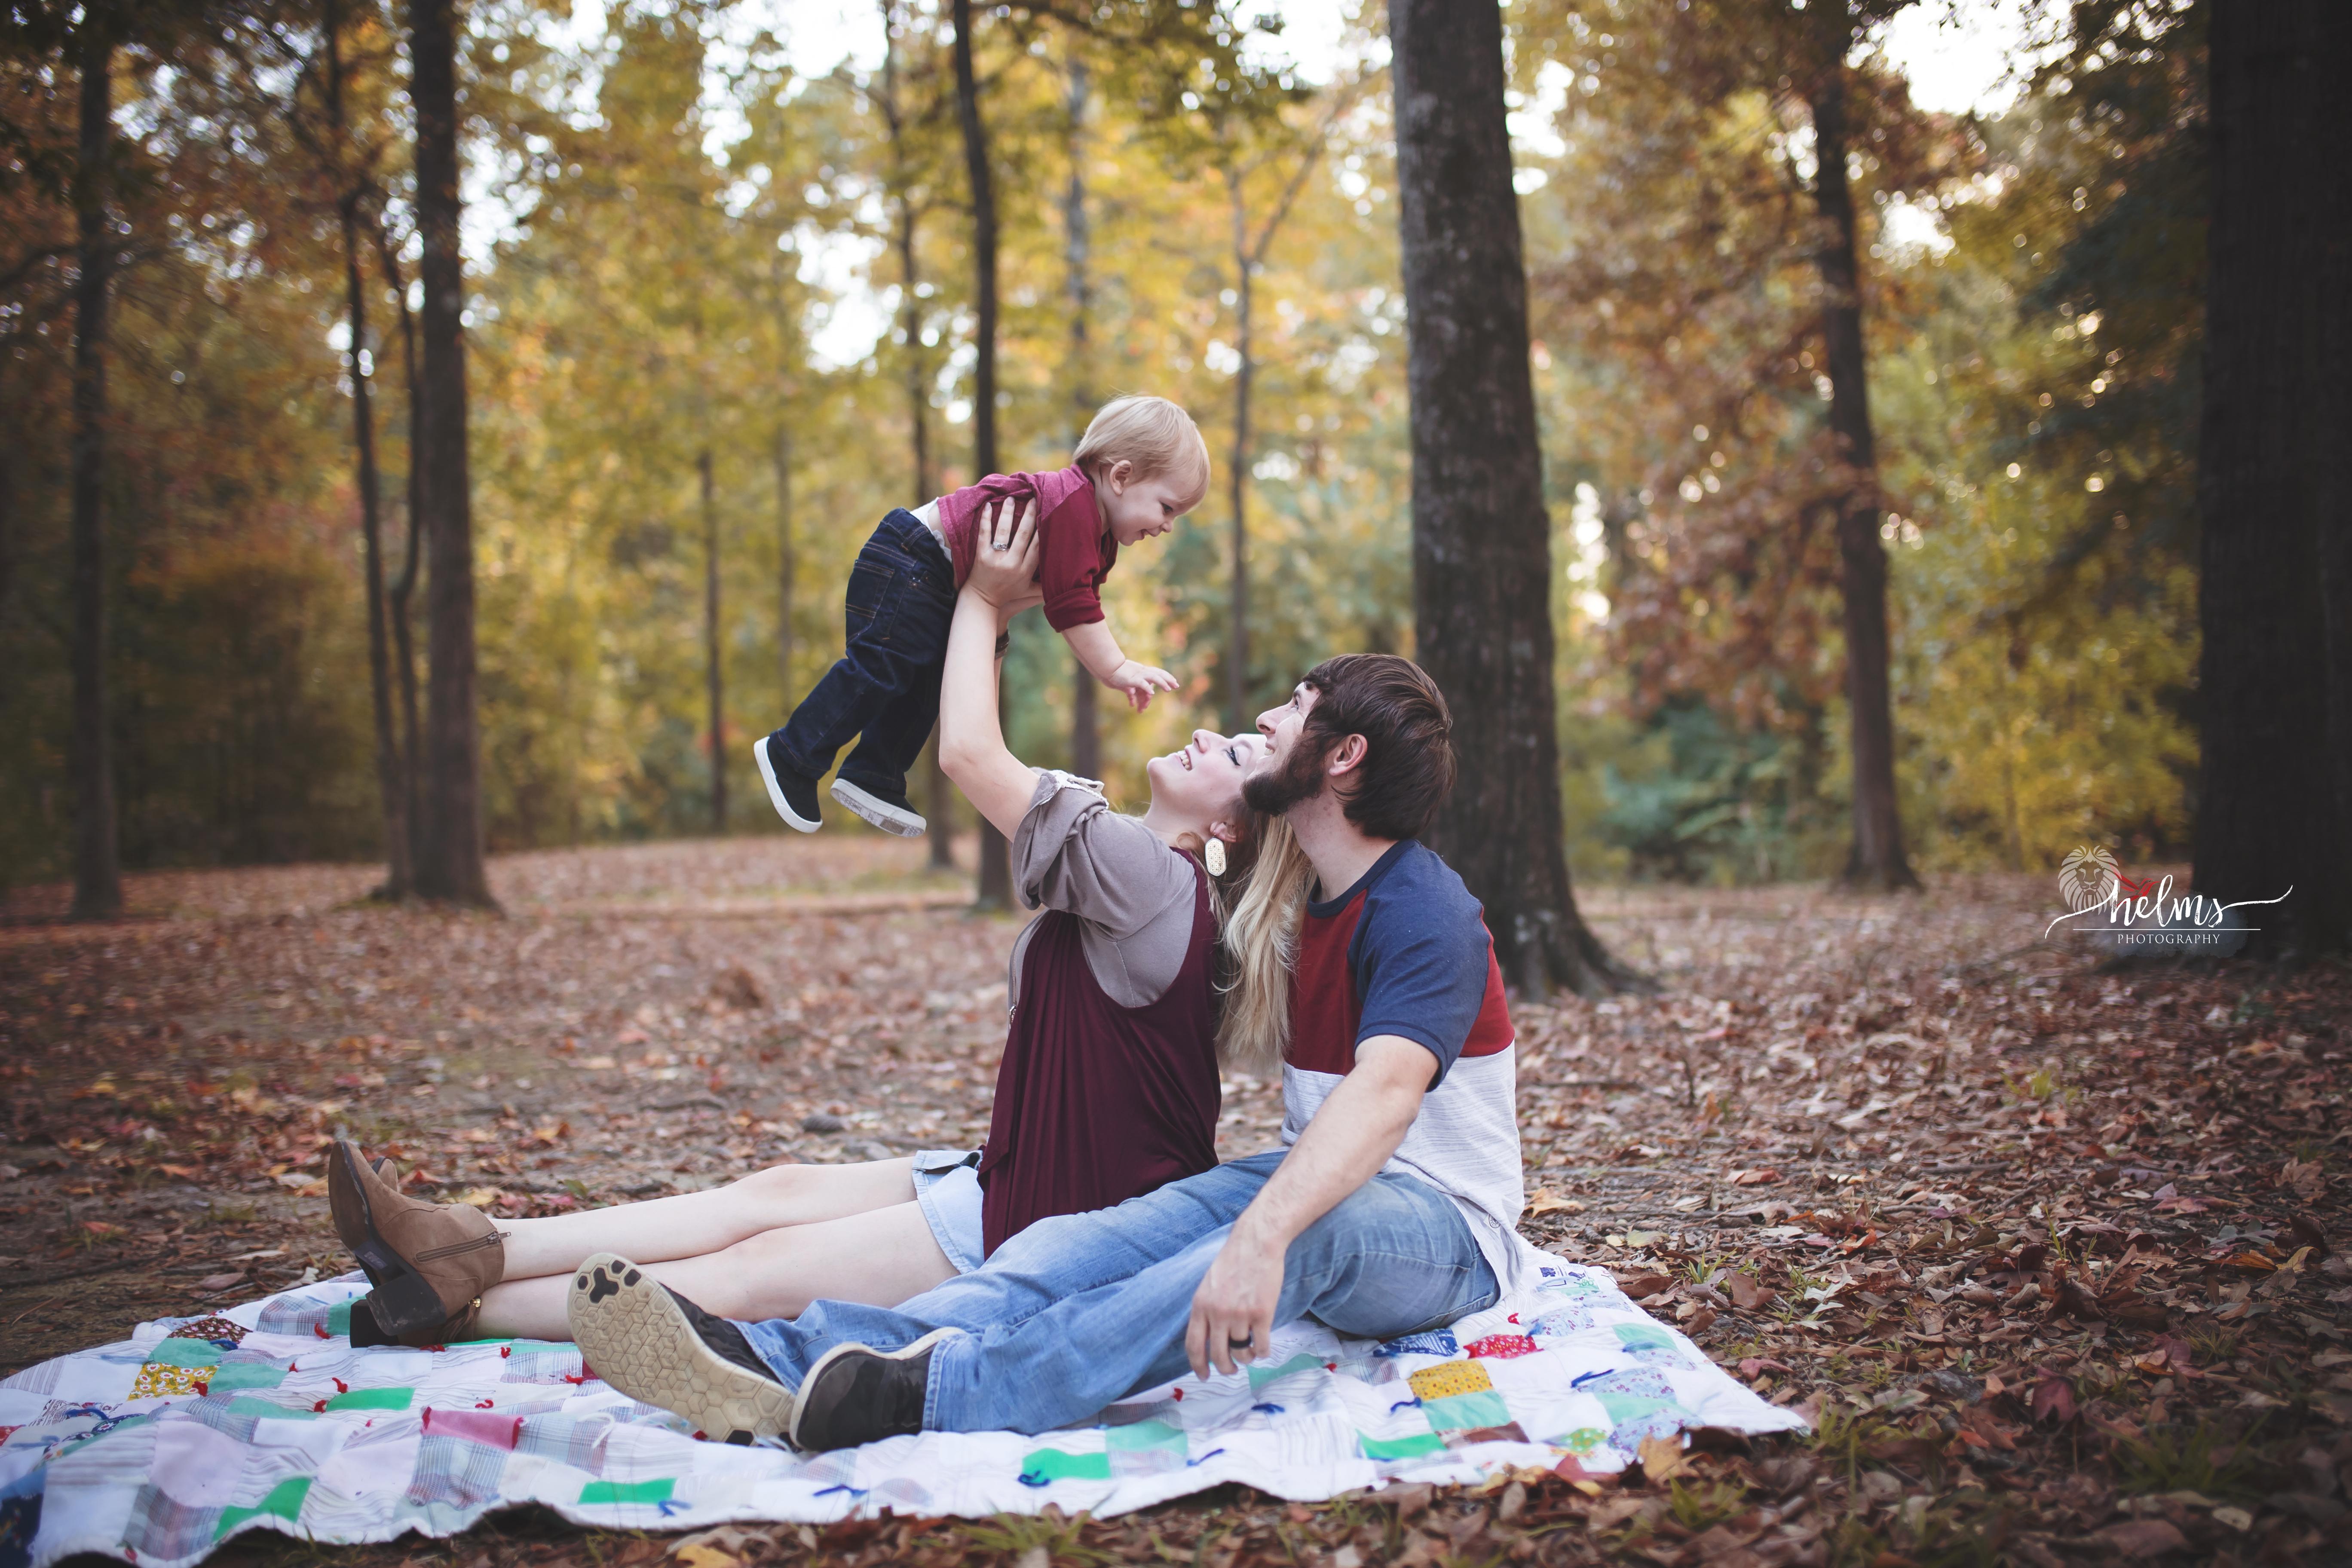 Outdoor Fall Family Photography Texarkana, Texas